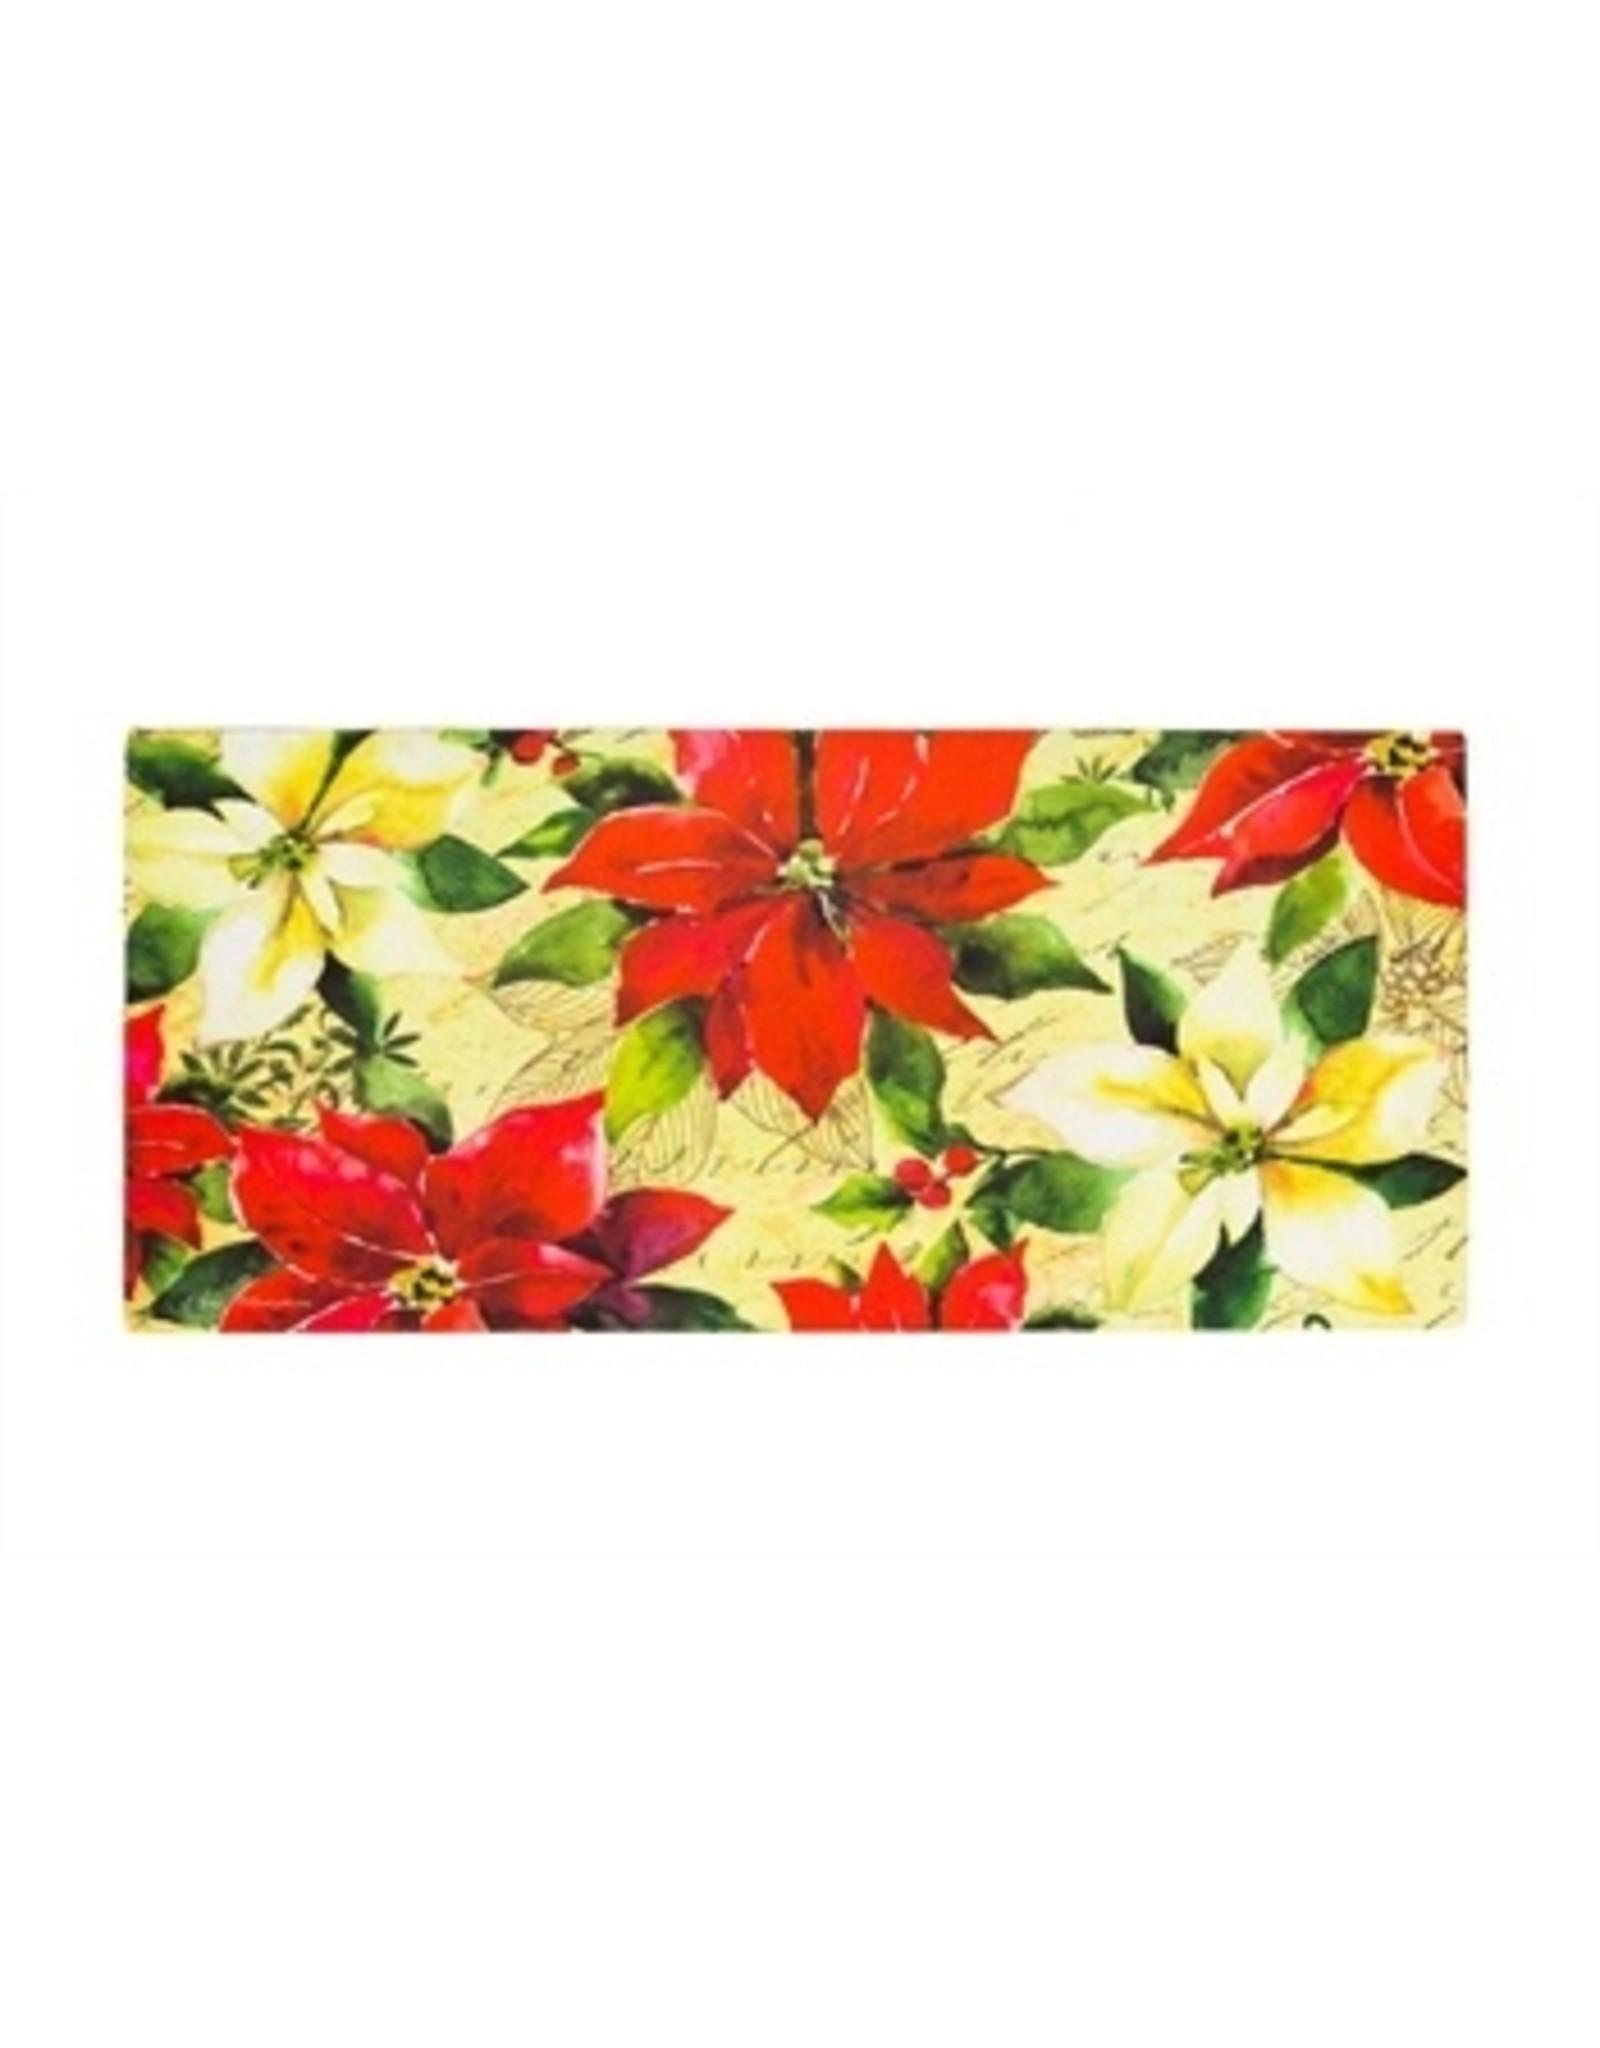 Evergreen Enterprises Watercolor Poinsetta Sassafras Switch Mat